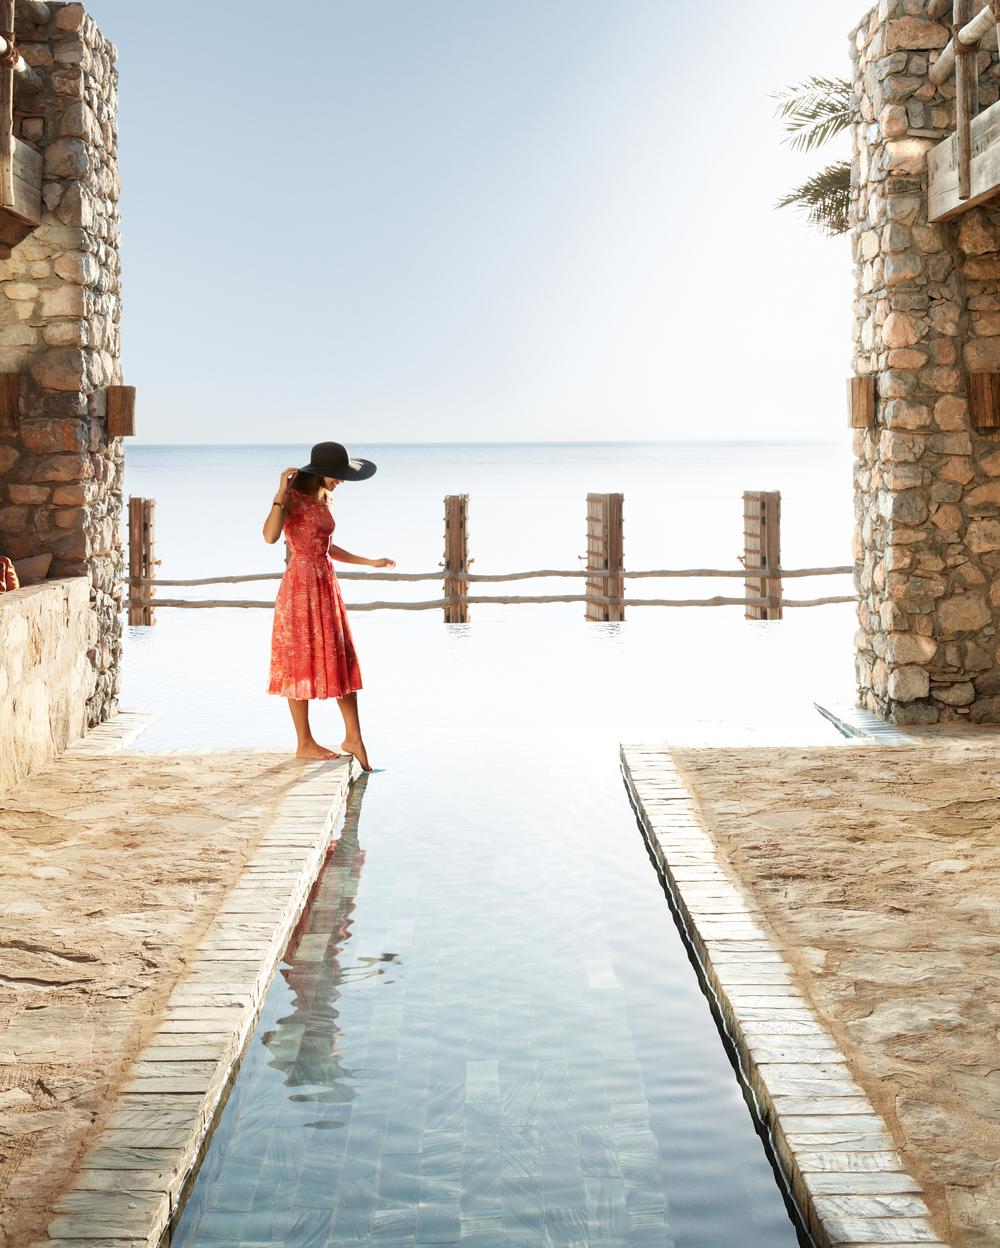 Six Senses, Zighy Bay, Oman.